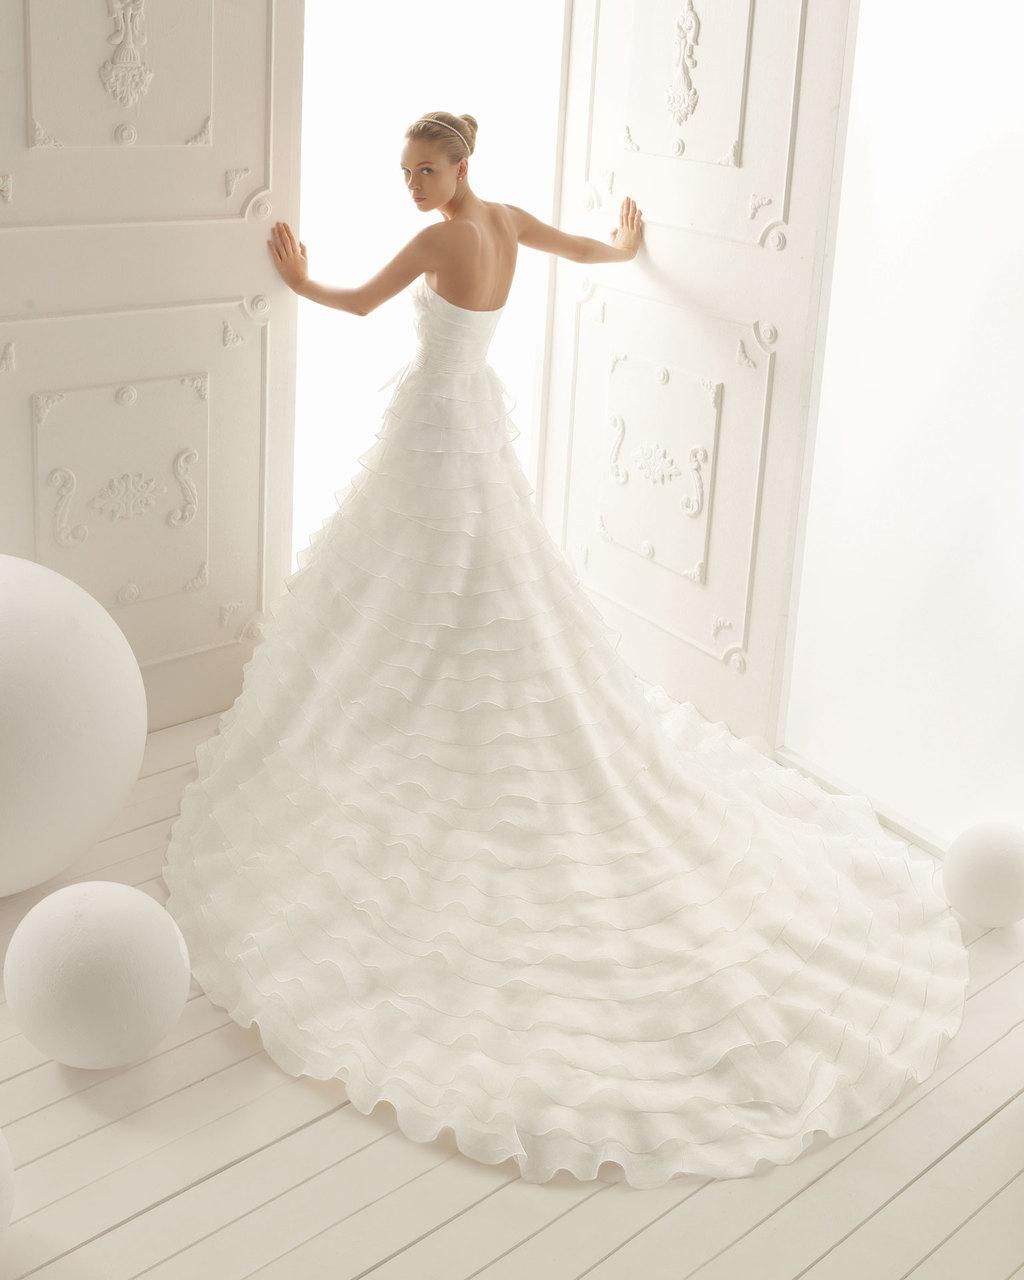 Aire-barcelona-wedding-dress-2013-vintage-bridal-collection-verona.full